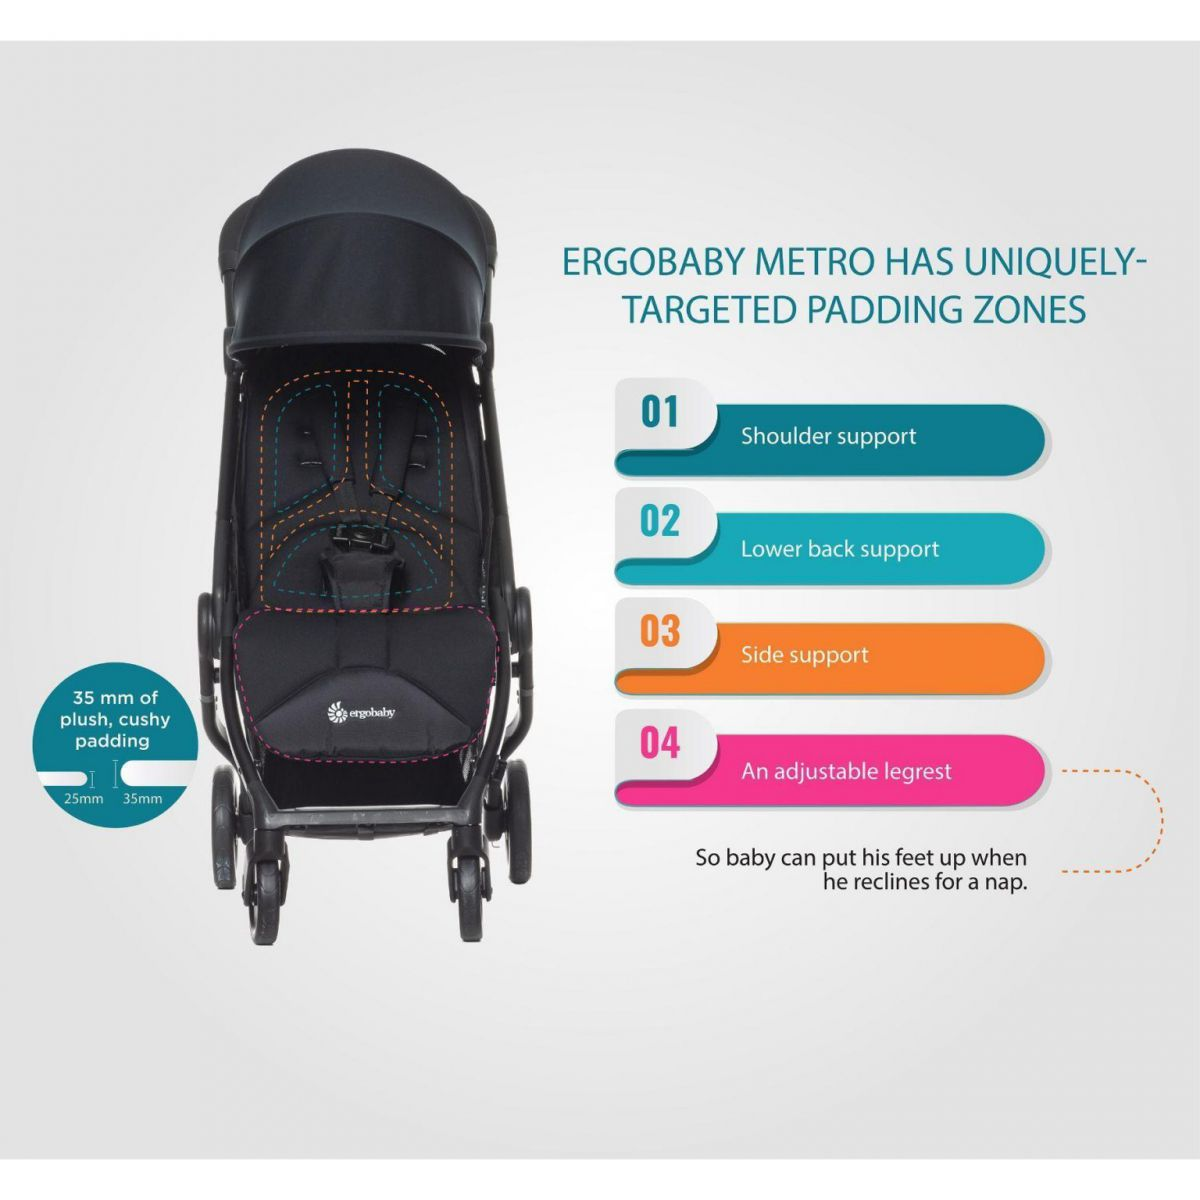 Xe đẩy Ergobaby Metro Compact City Stroller - Màu đen